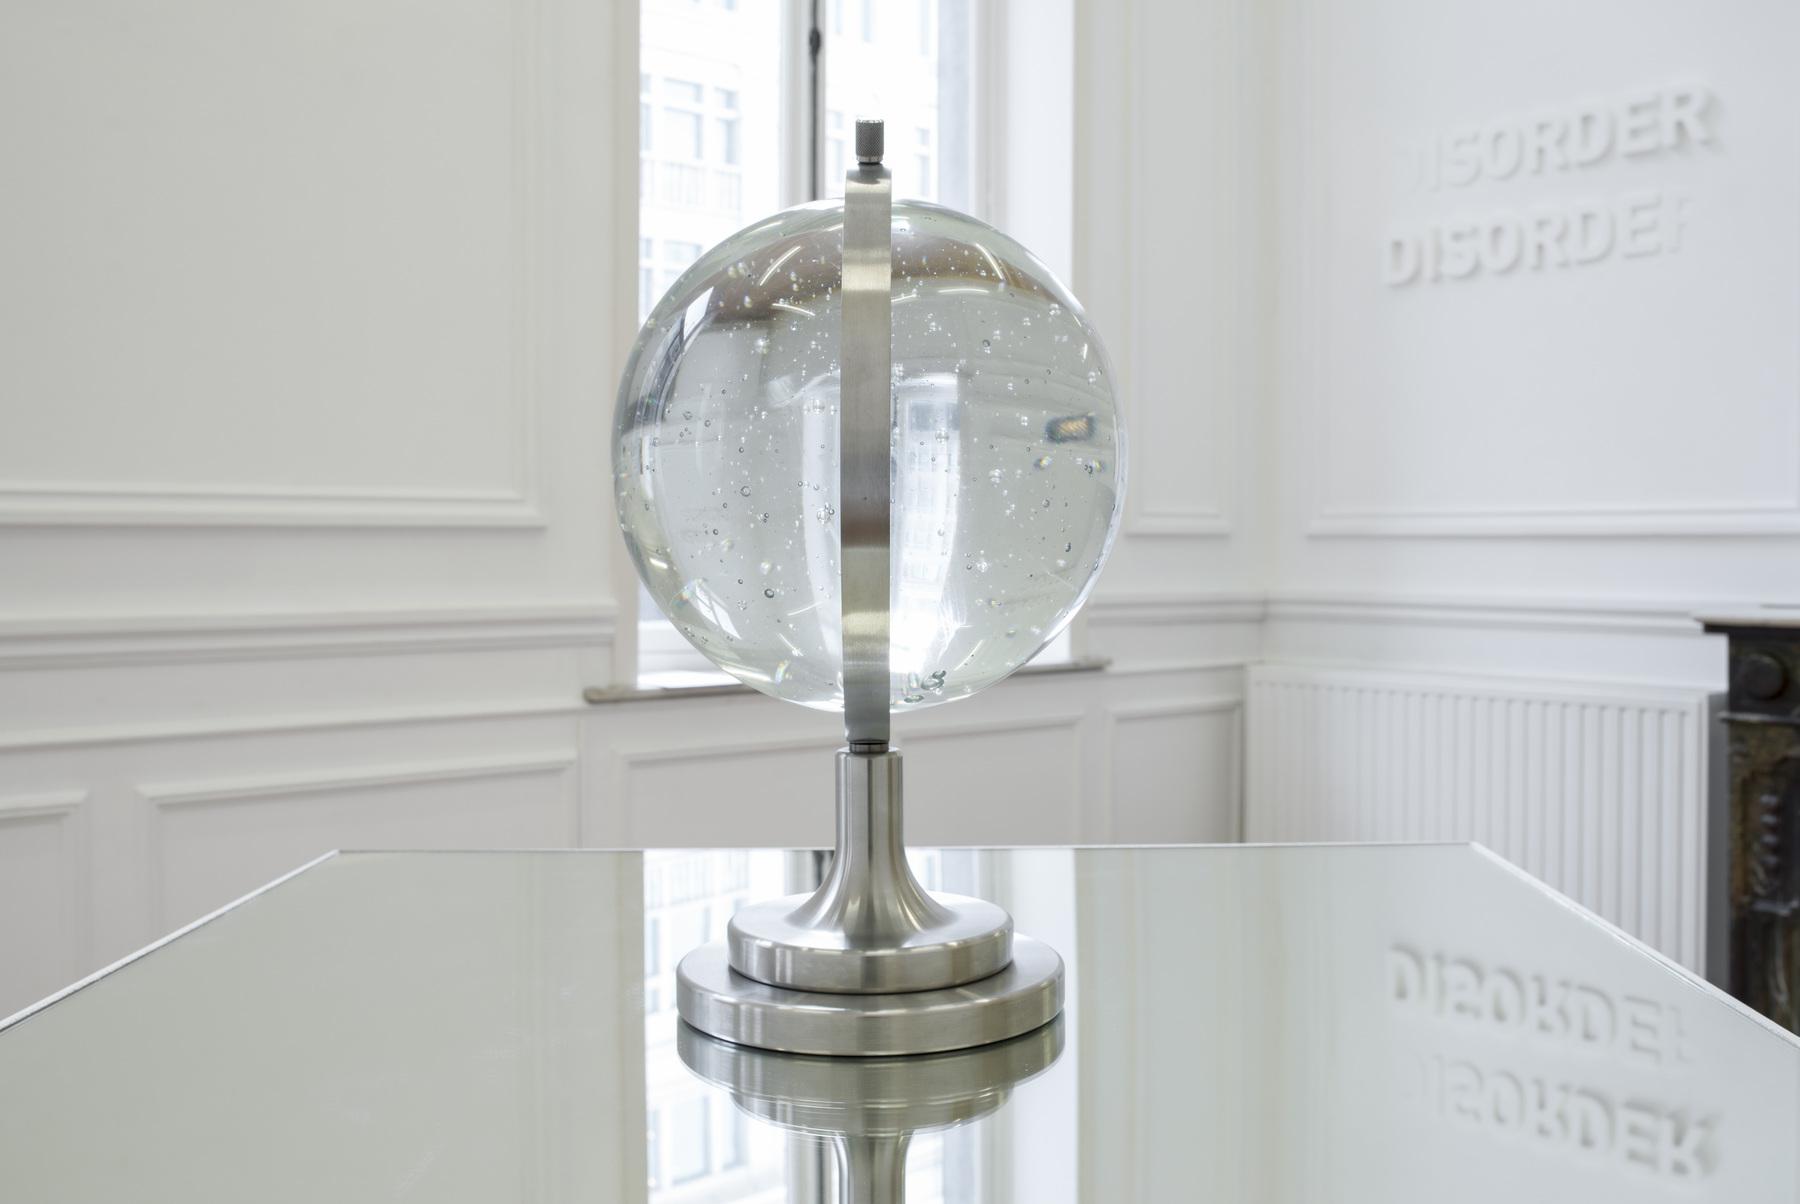 Melik Ohanian, Futuring (cosmos), 2011, Glass, metal, mirror, Glass ball Ø 30 cm, Pedestal and mirror 100 x 100 x 100cm, 1_3